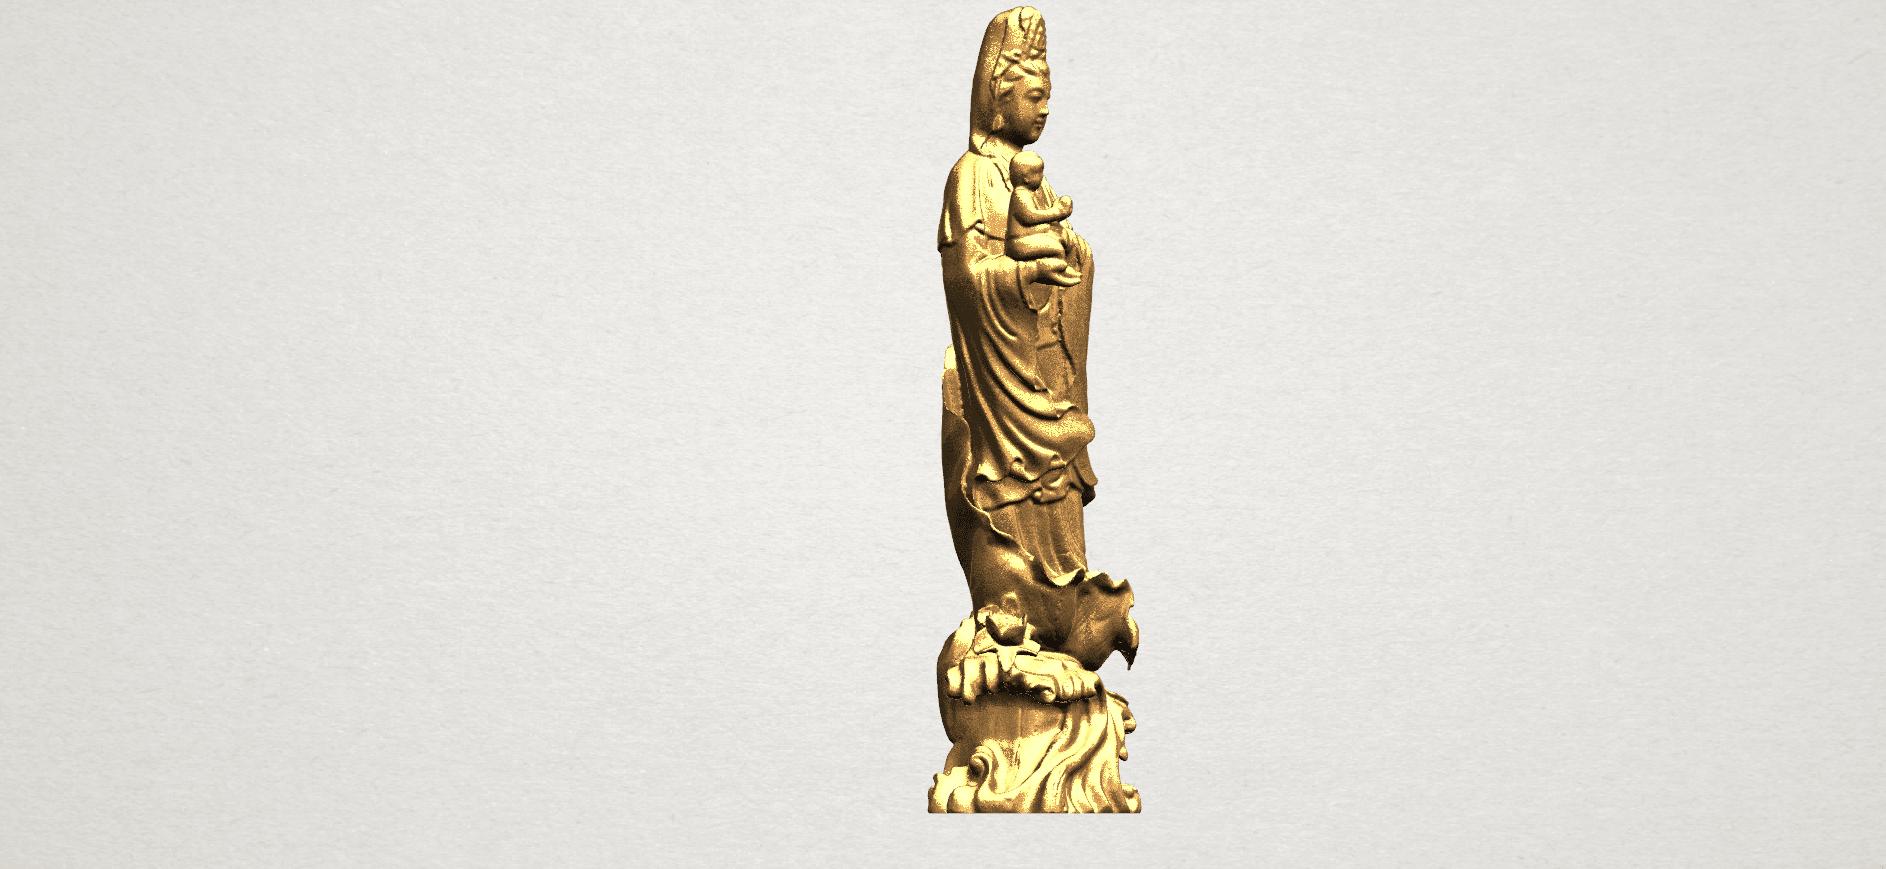 Avalokitesvara Buddha  award kid (i) A08.png Download free STL file Avalokitesvara Bodhisattva - award kid 01 • 3D print object, GeorgesNikkei